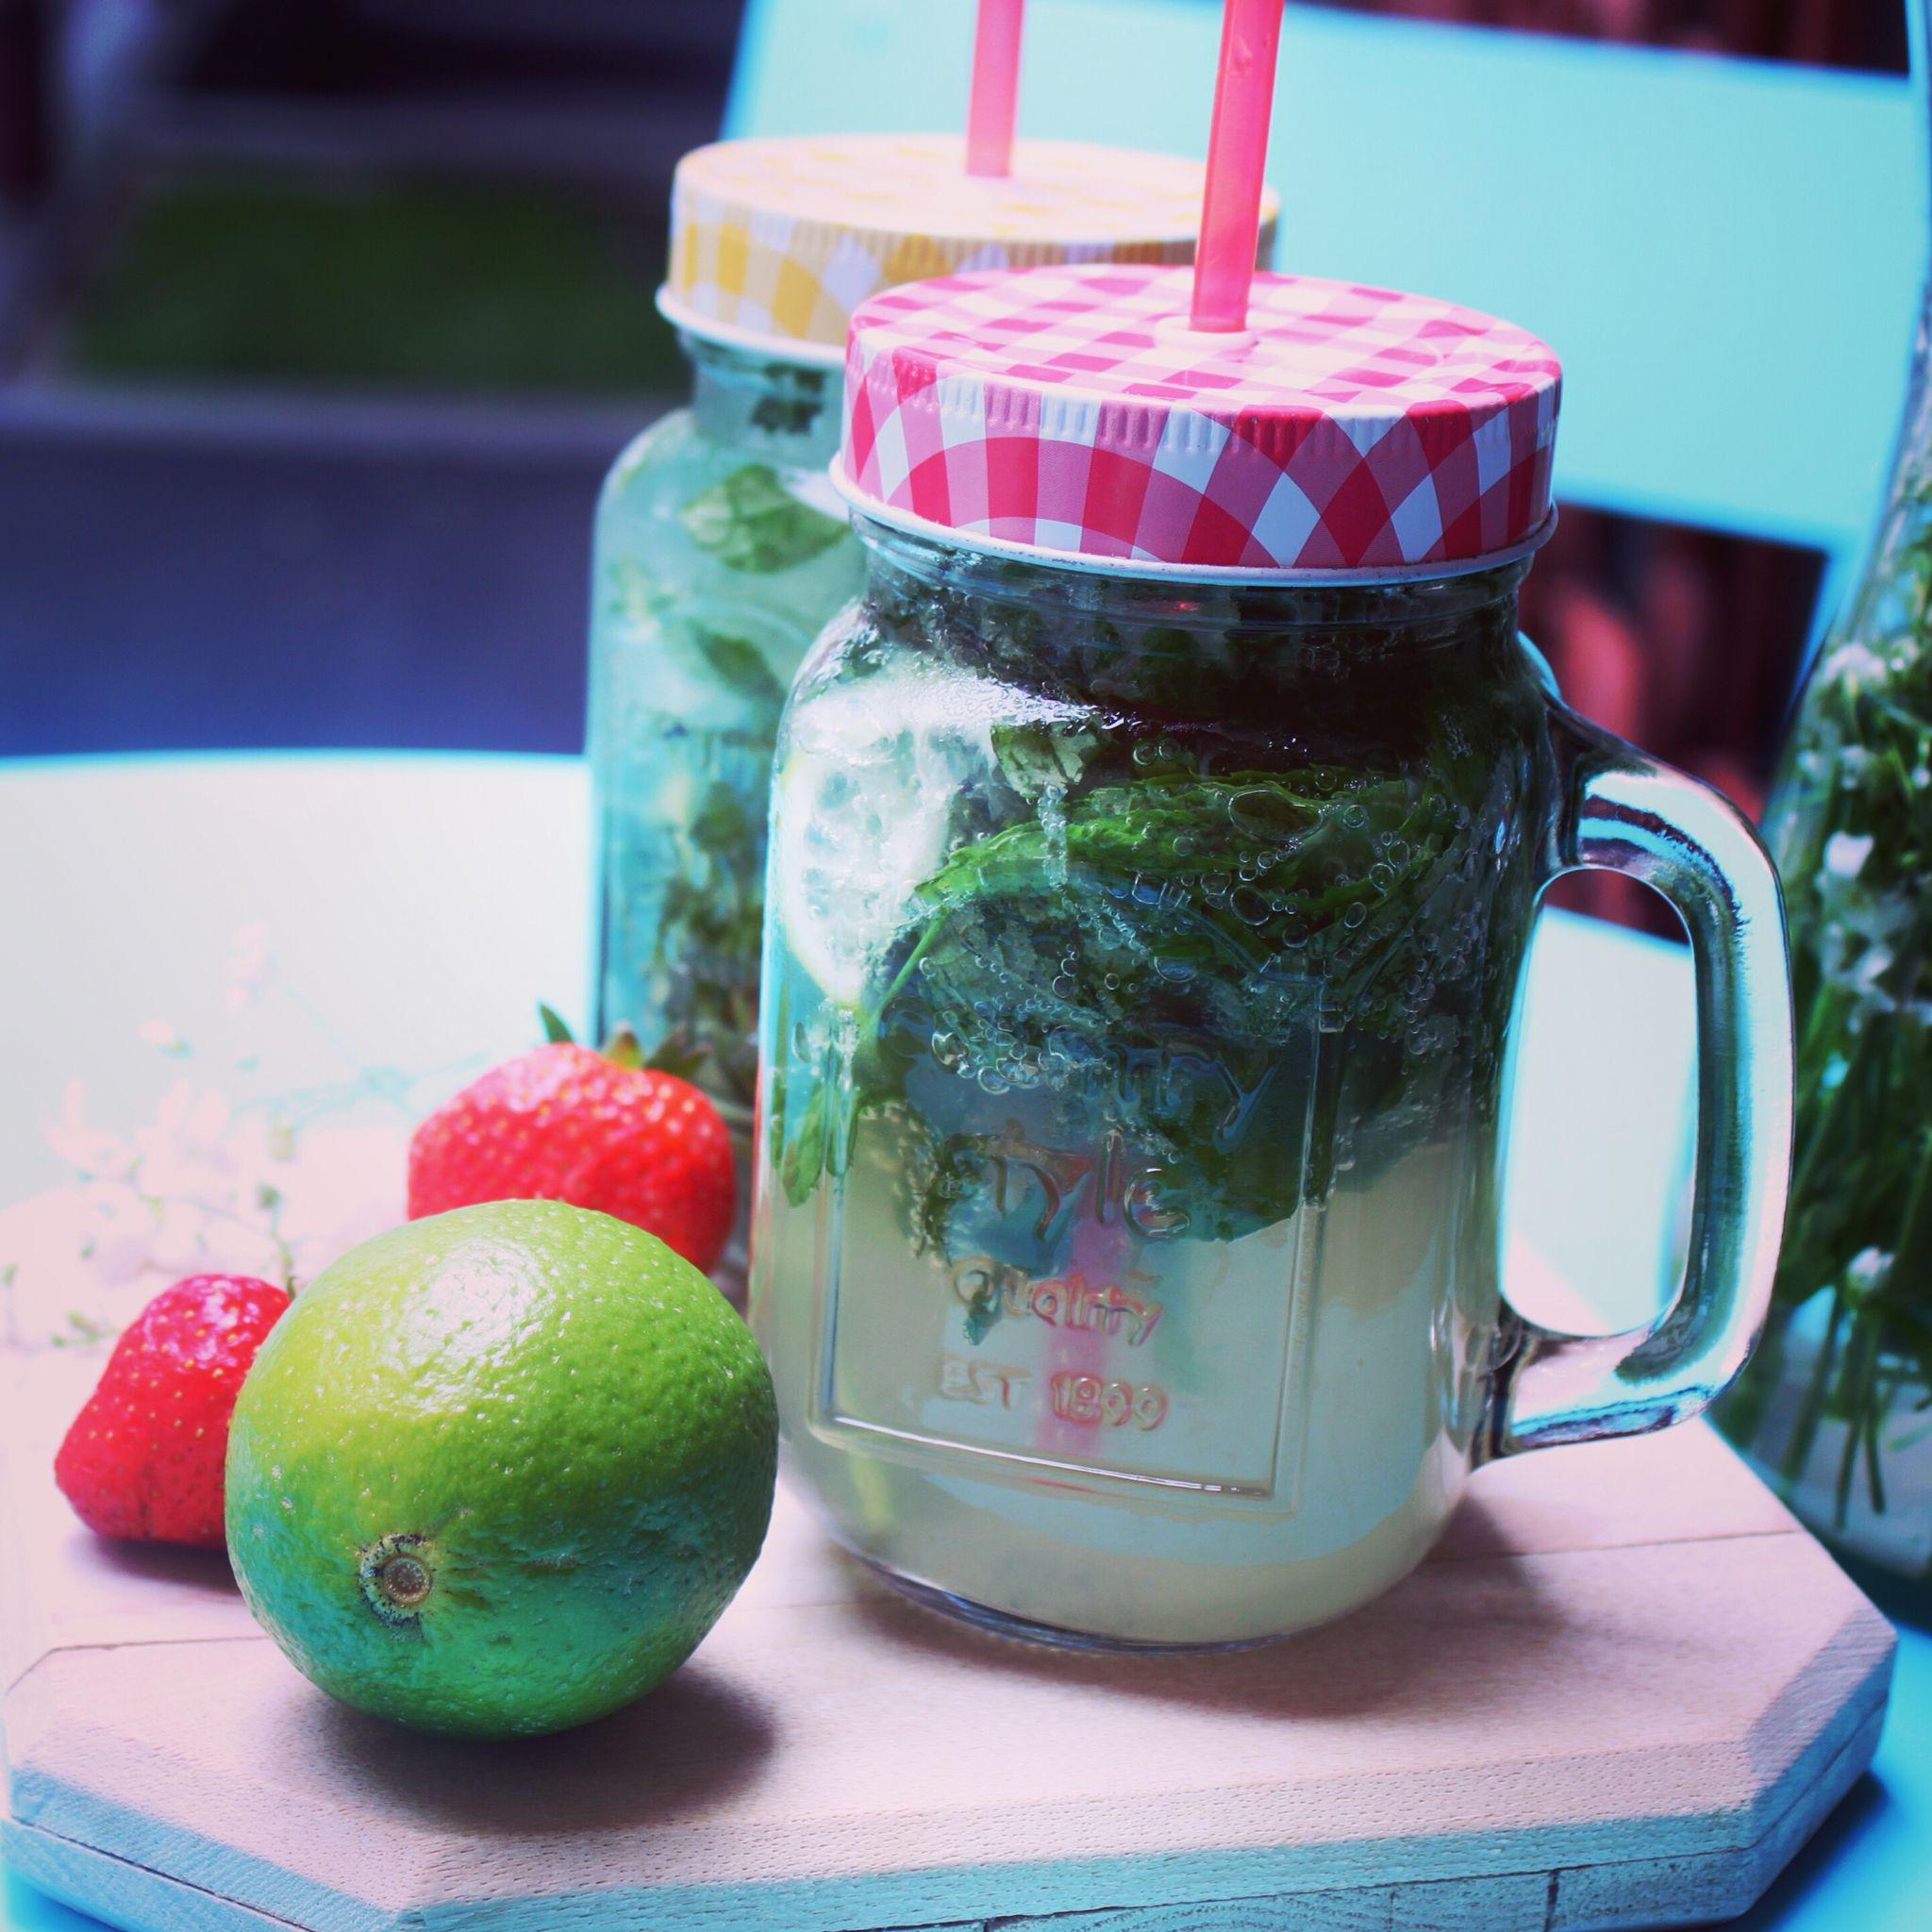 I love the homemade lemonade and those cute jars from coincasa.